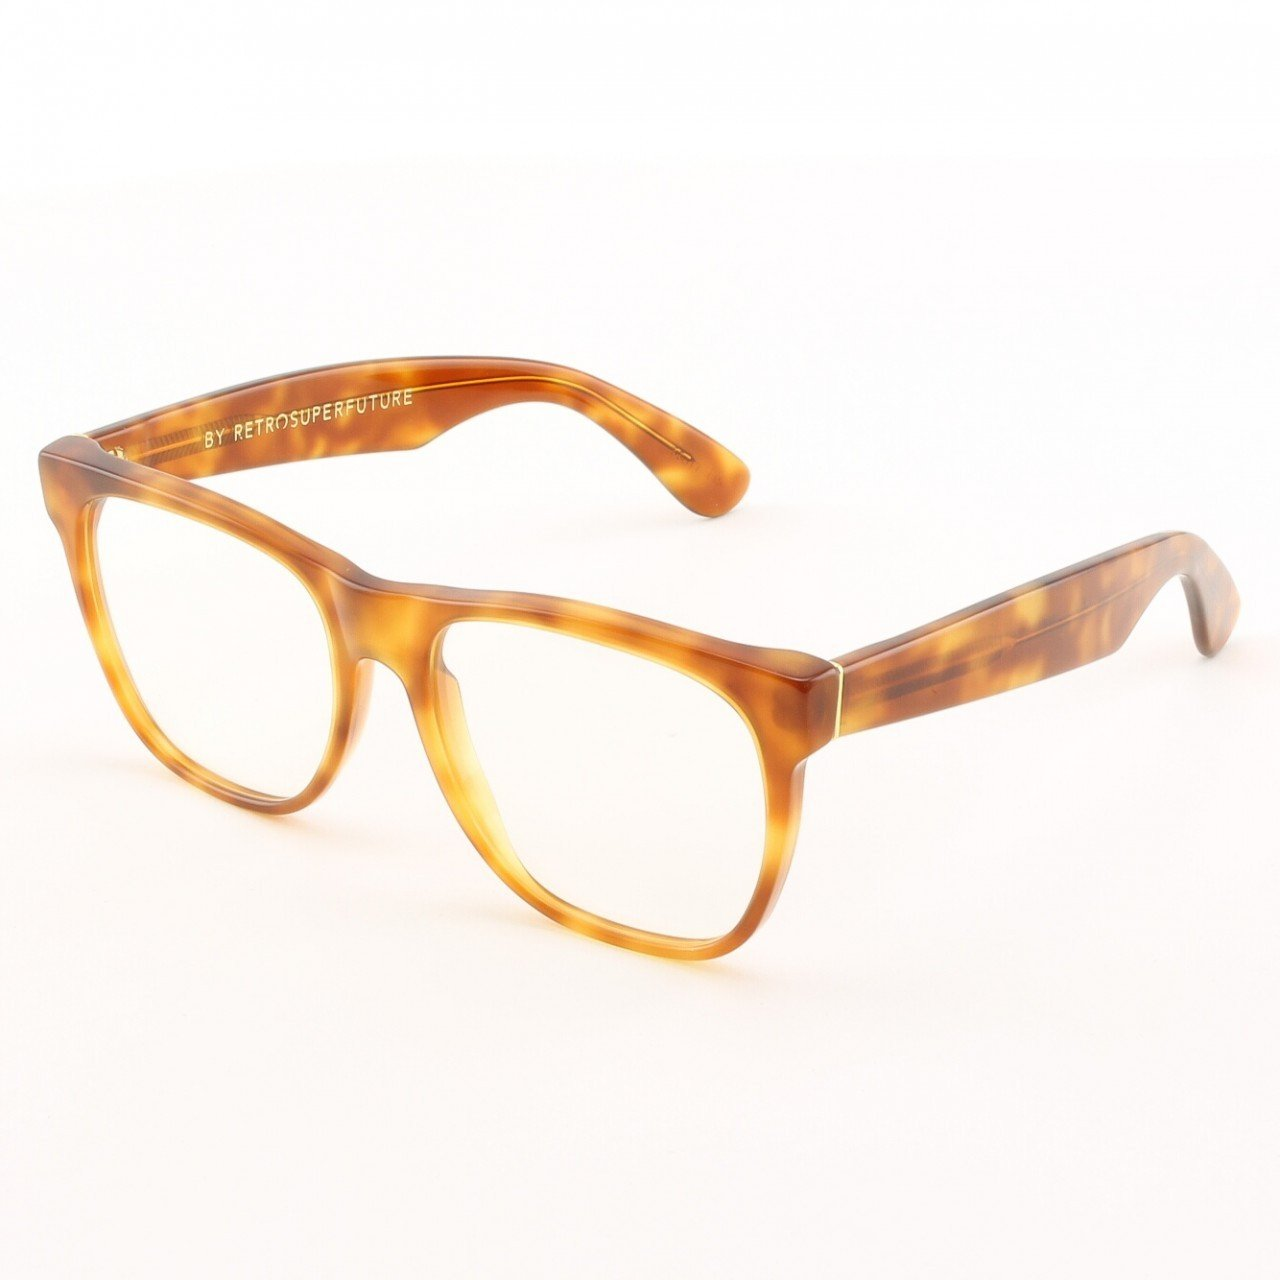 Super Classic 619 Wayfarer Eyeglasses Light Havana with Clear Zeiss Lenses by RETROSUPERFUTURE